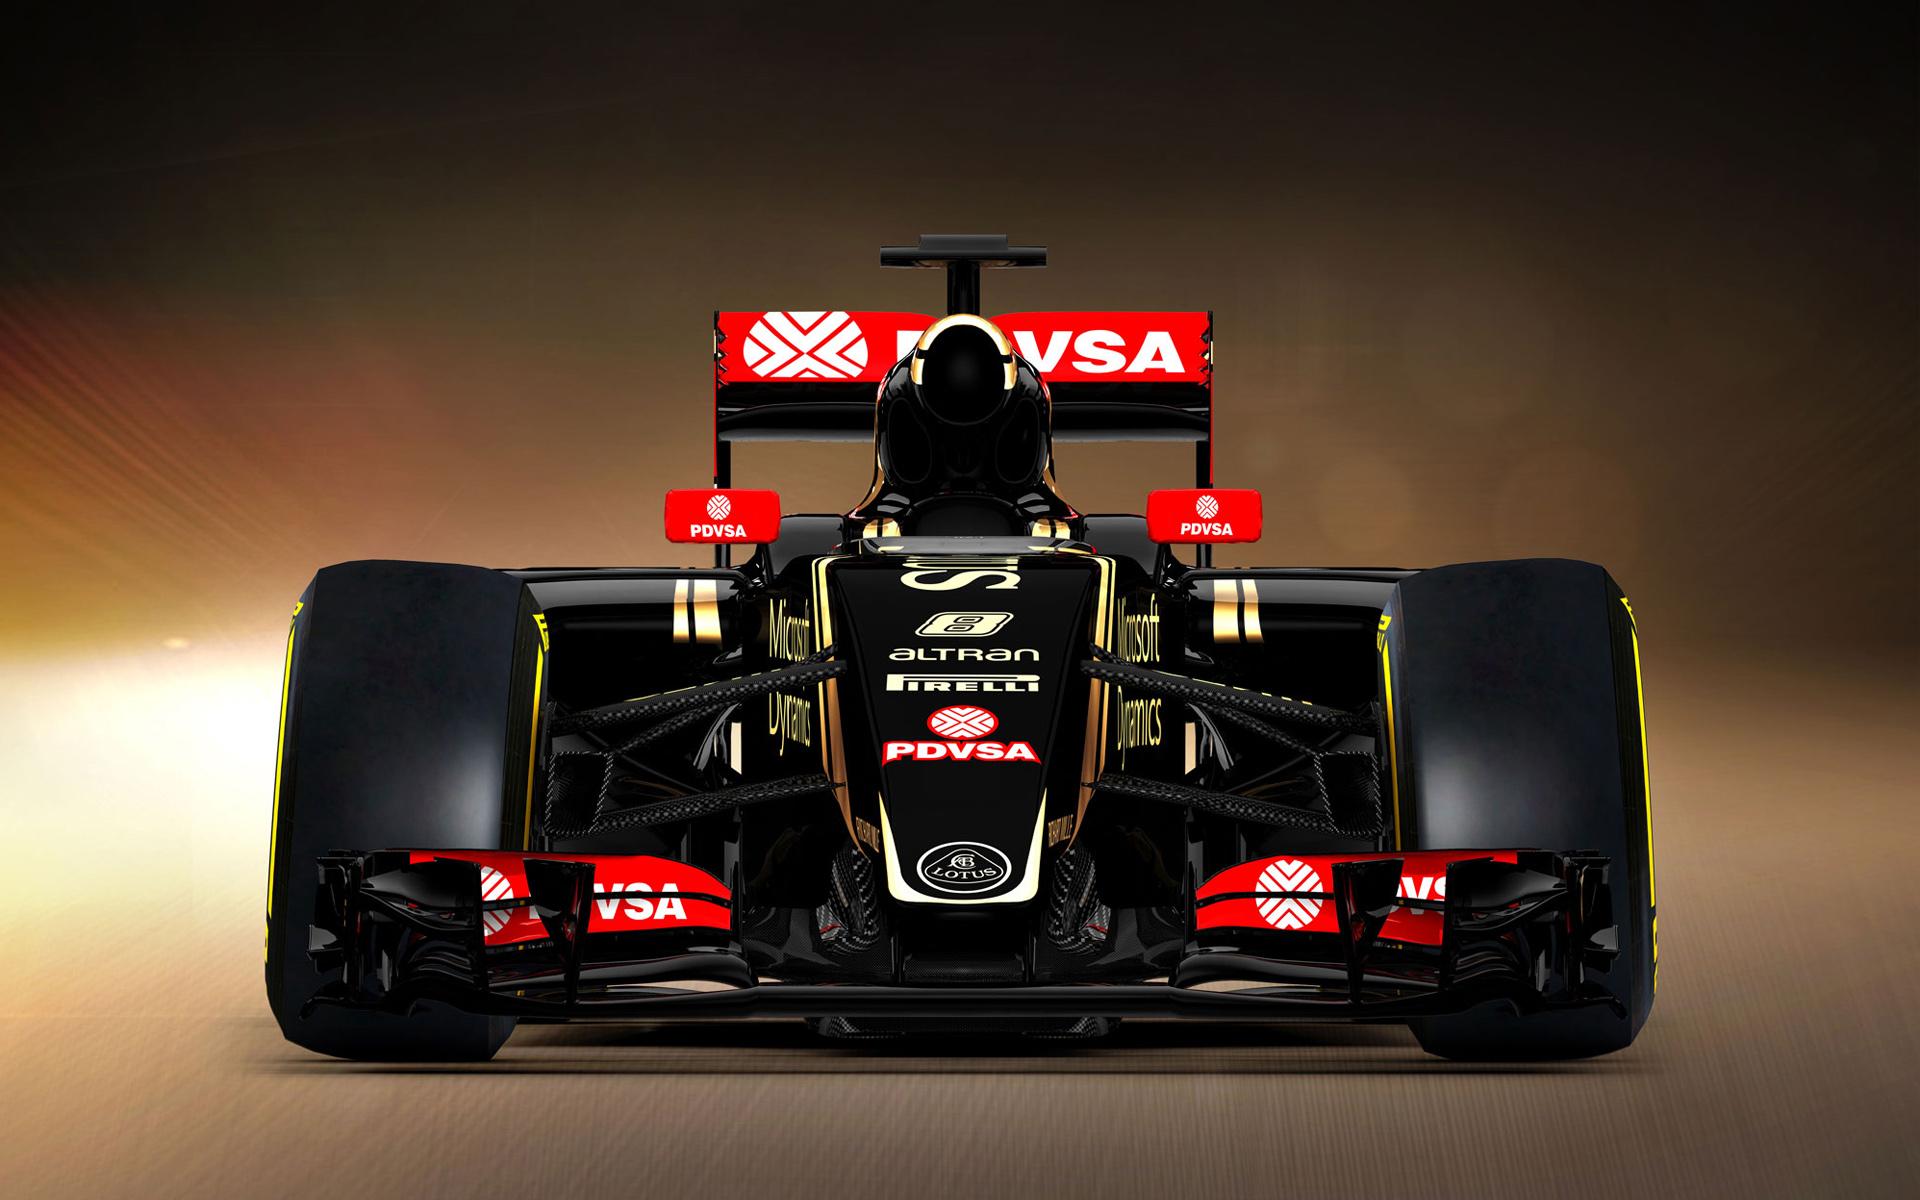 2015 Lotus E23 F1 3 Wallpaper   HD Car Wallpapers